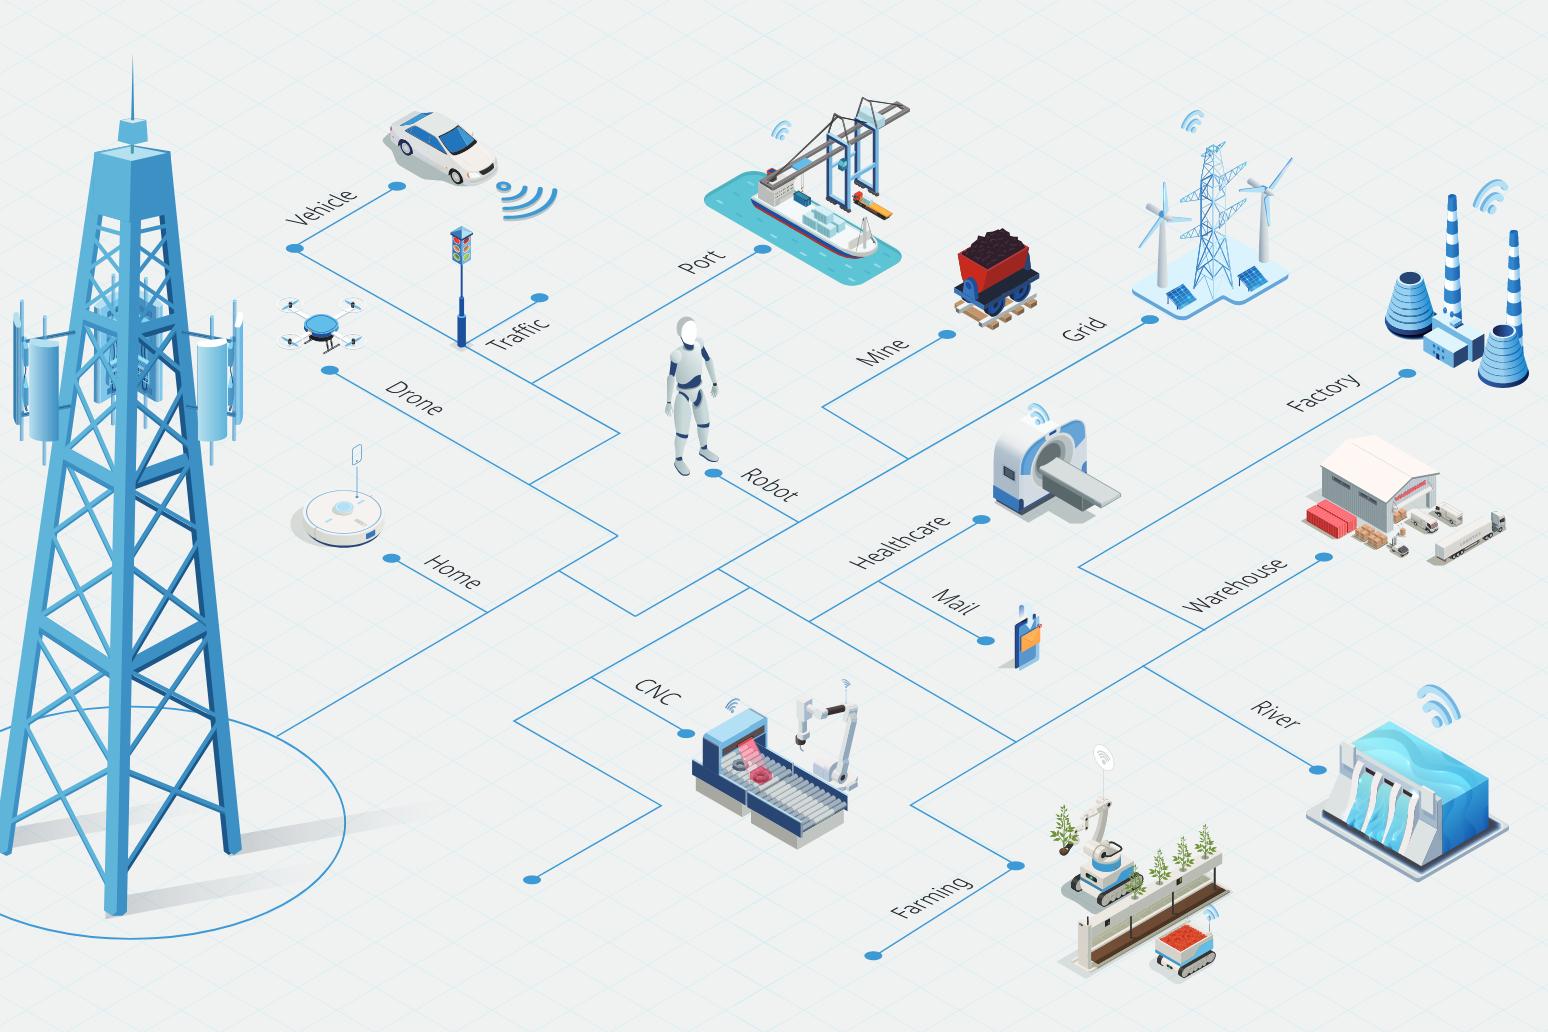 10 Trends in 5G - Whitepaper